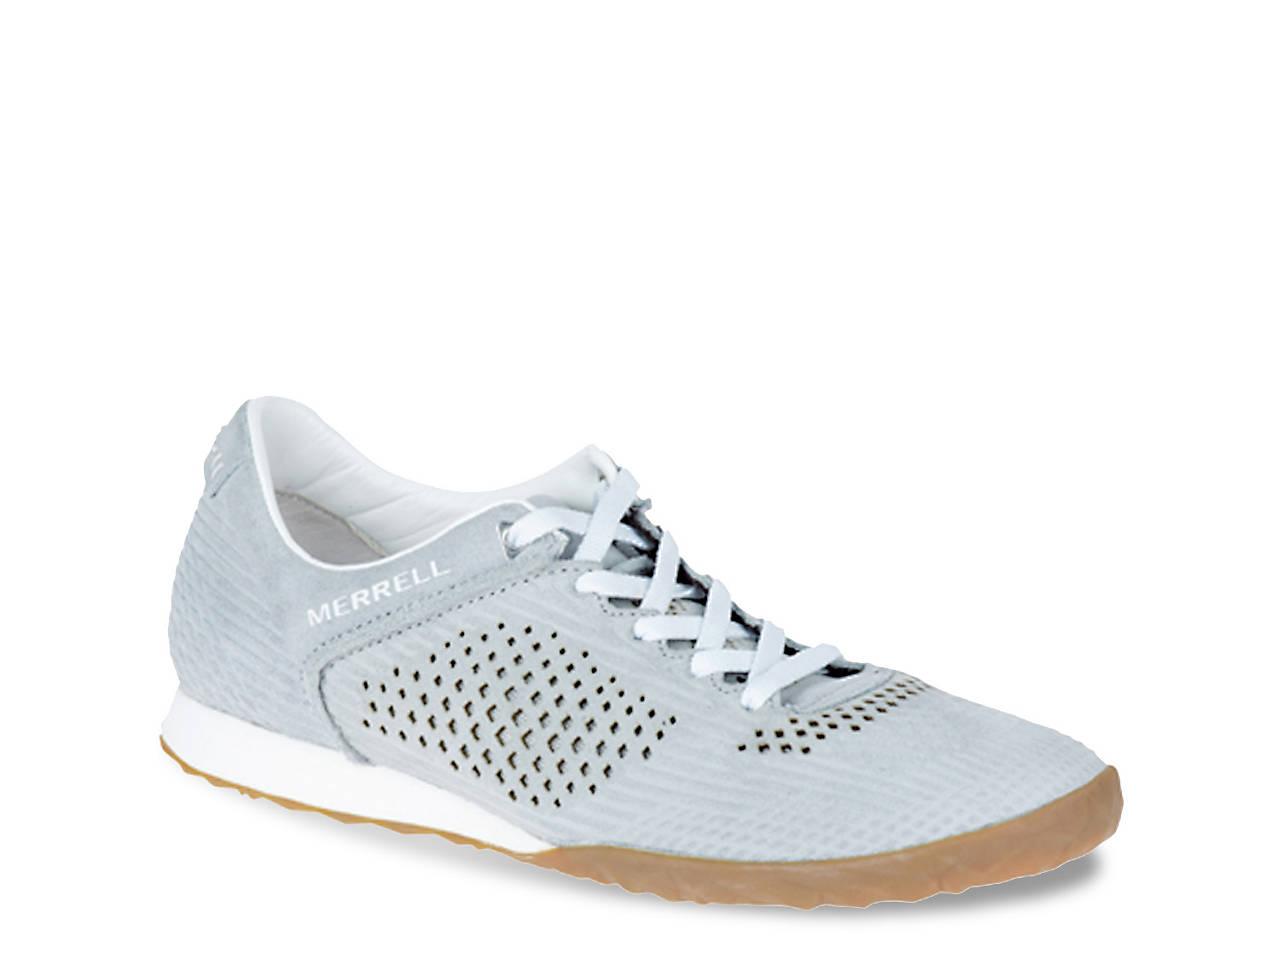 8269378ff Merrell Civet Sport Breeze Sneaker Women s Shoes